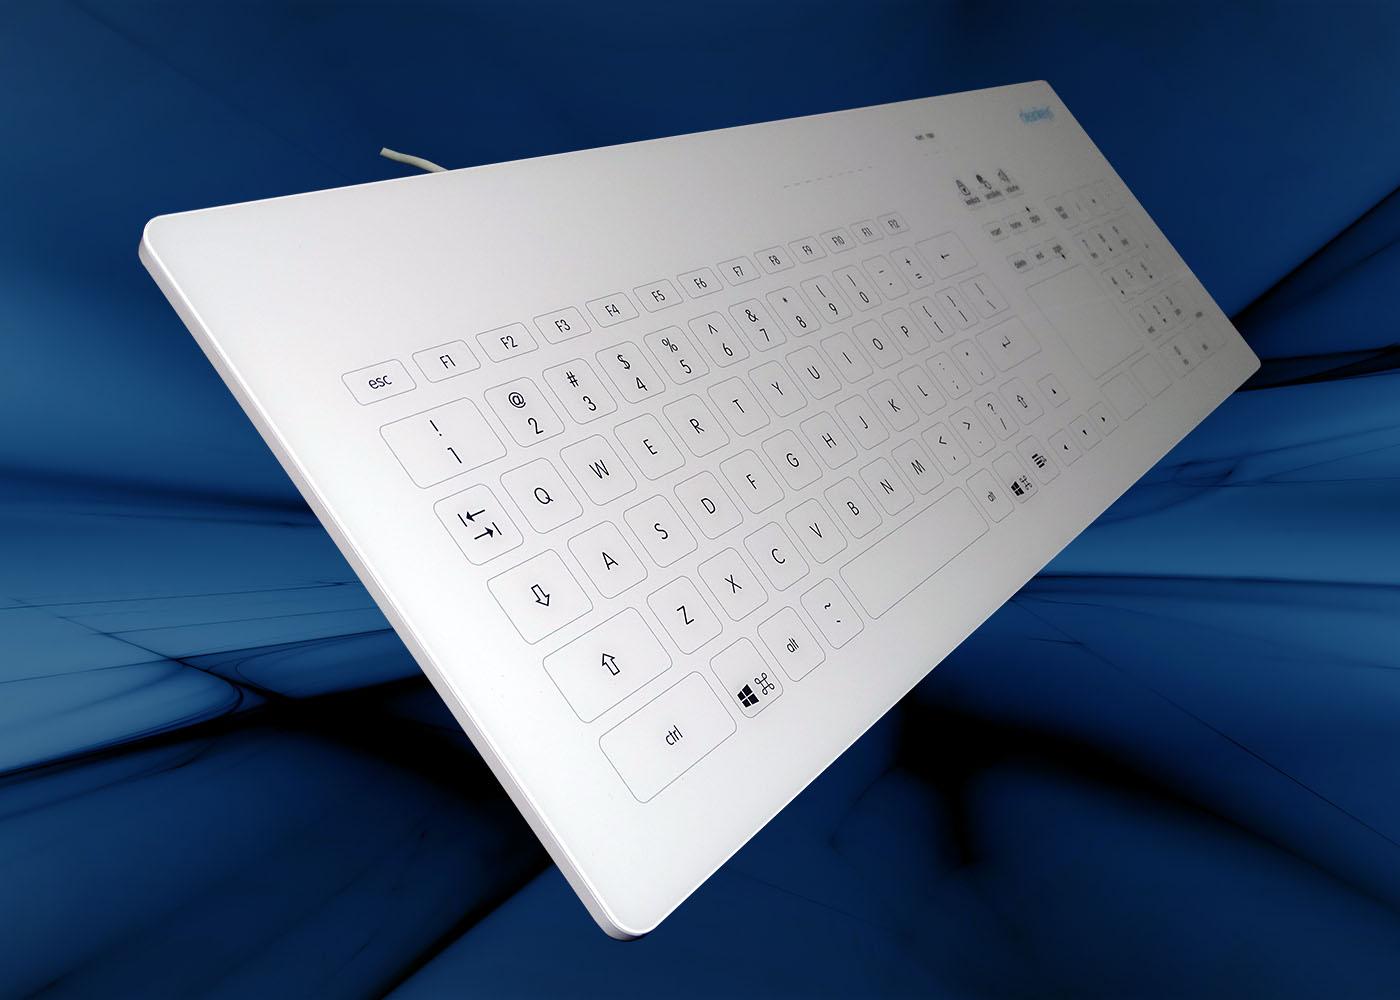 NX6010 : clavier verre tactile capacitif filaire avec touchpad – Profil